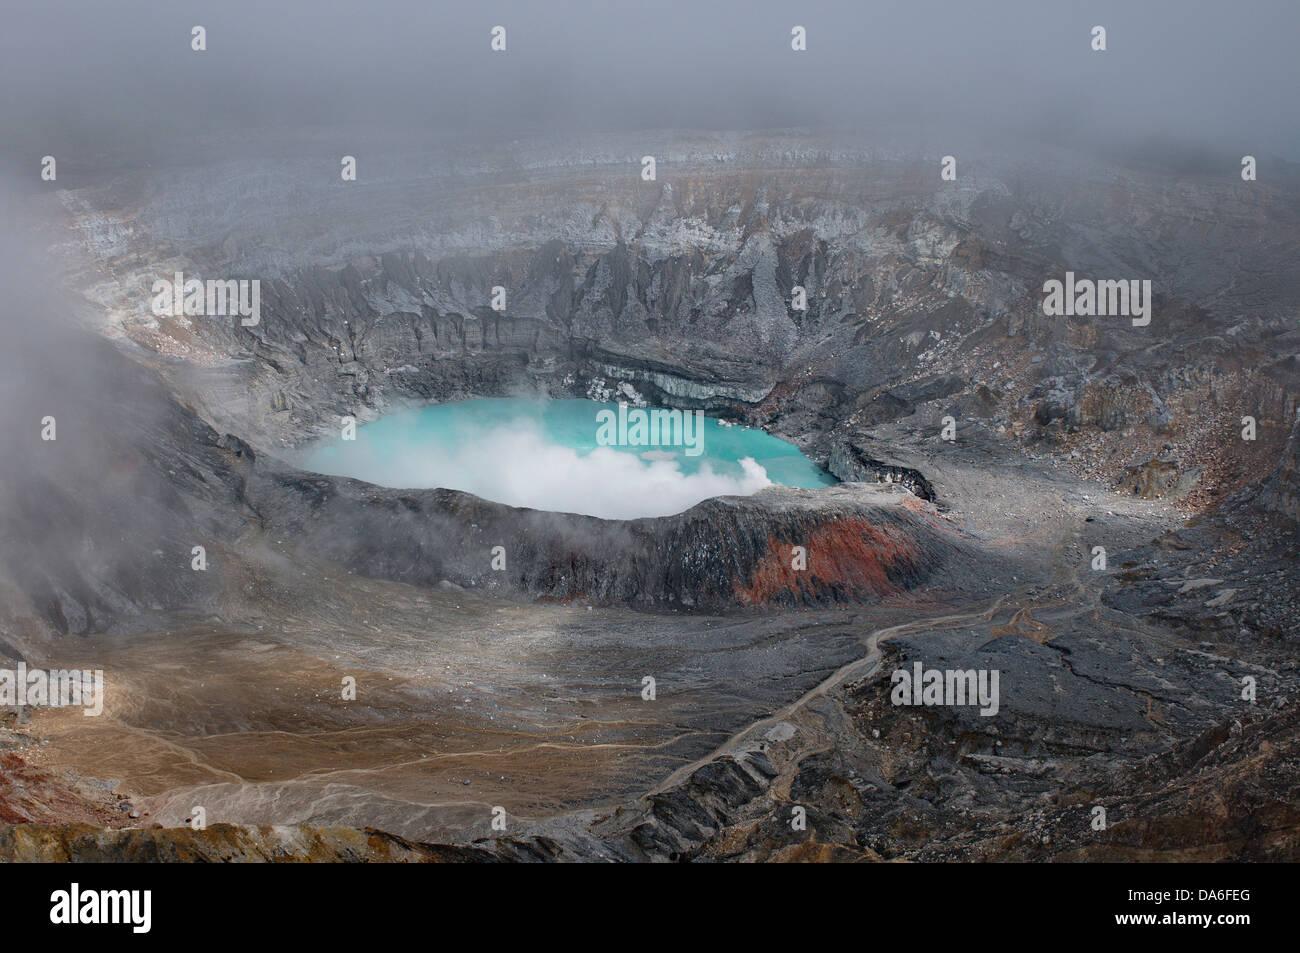 volcano, crater, Volcán Poás, Cordillera central, Costa Rica, Central America, Volcanism, sulphur, steam, - Stock Image